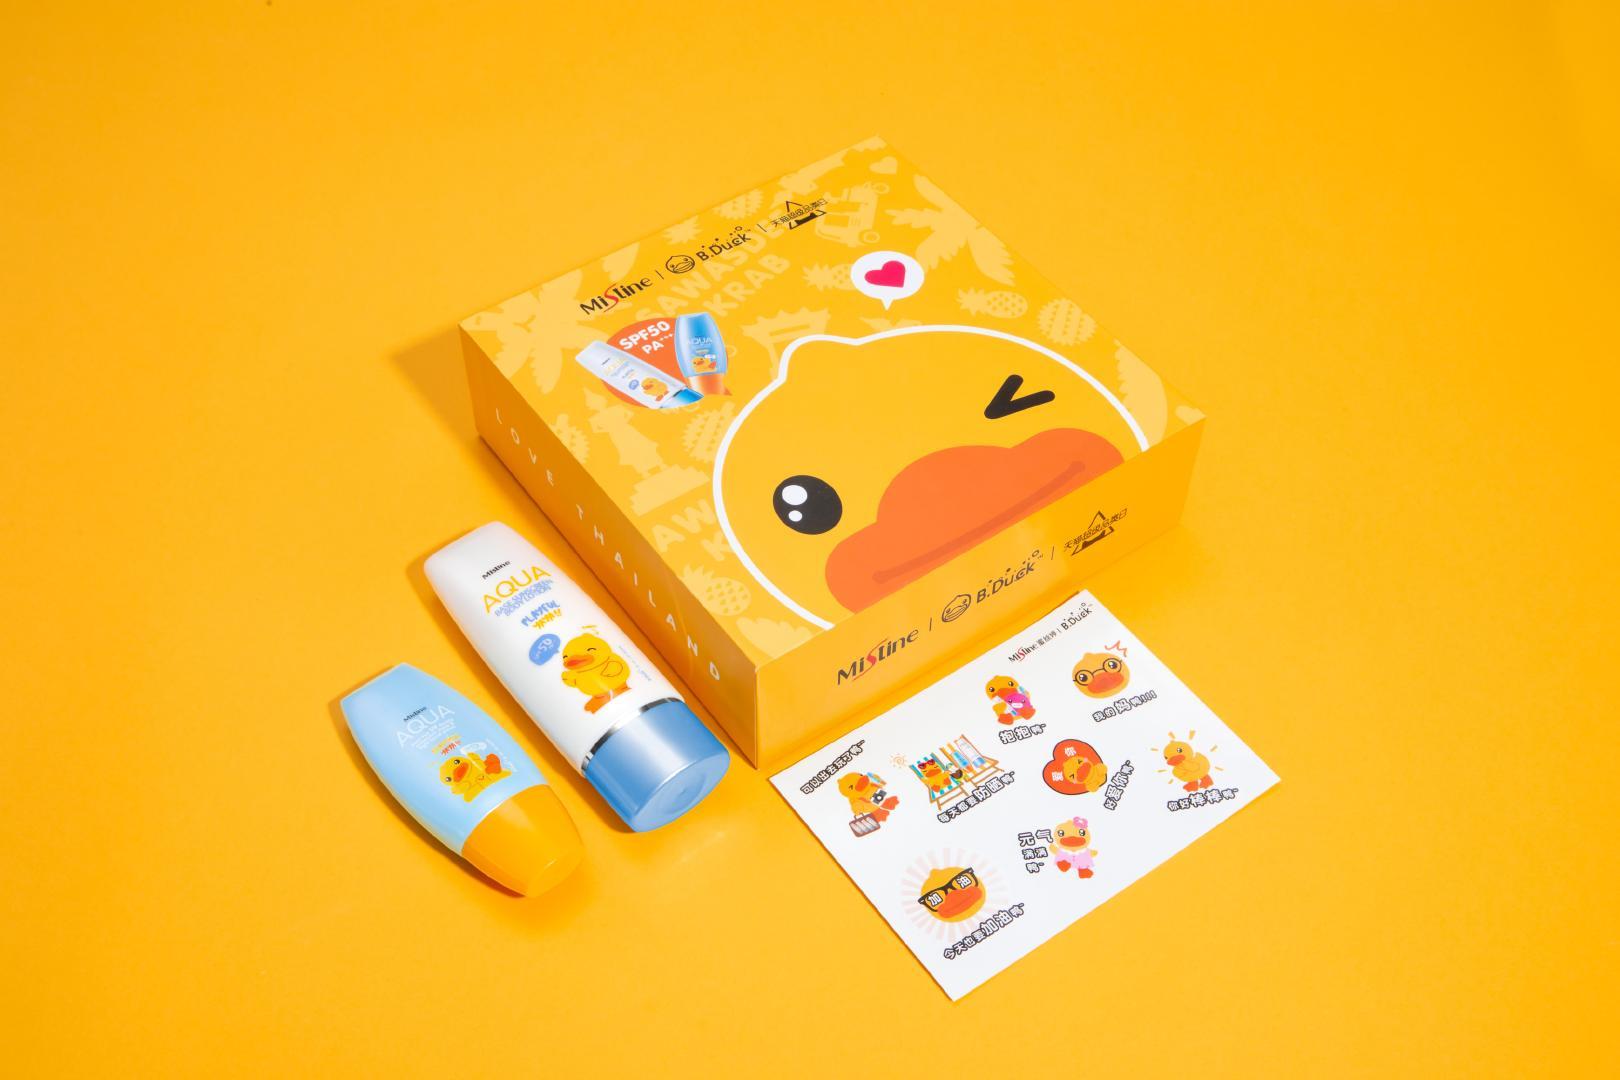 Mistine的小黄帽、小蓝帽是防晒届的楚翘,而小黄鸭不愧是网红鸭